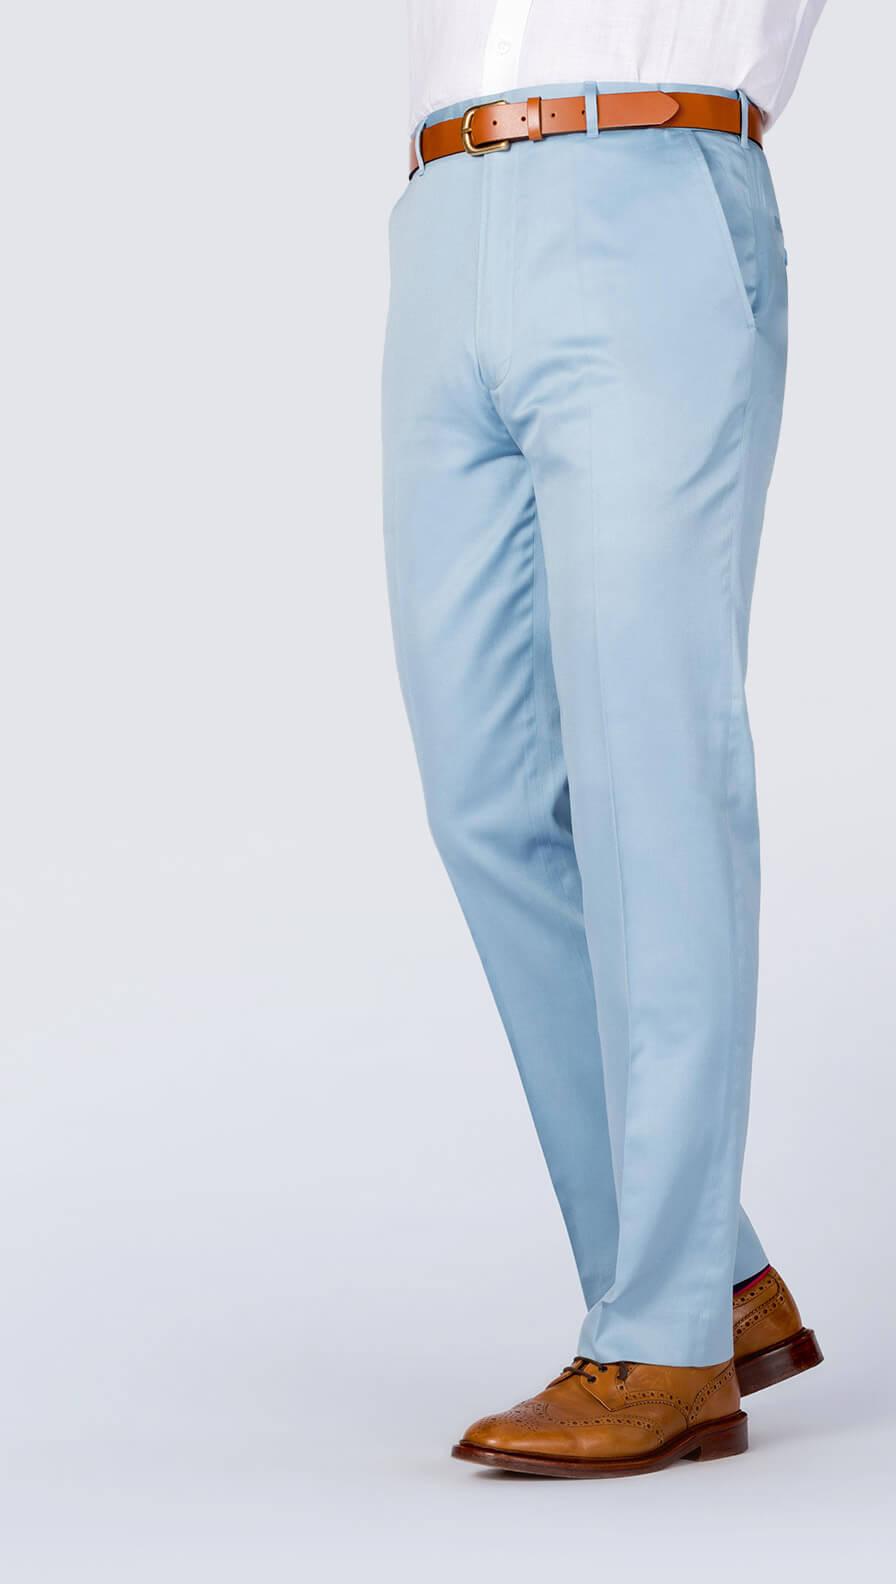 Trousers & Jeans - Shop Now